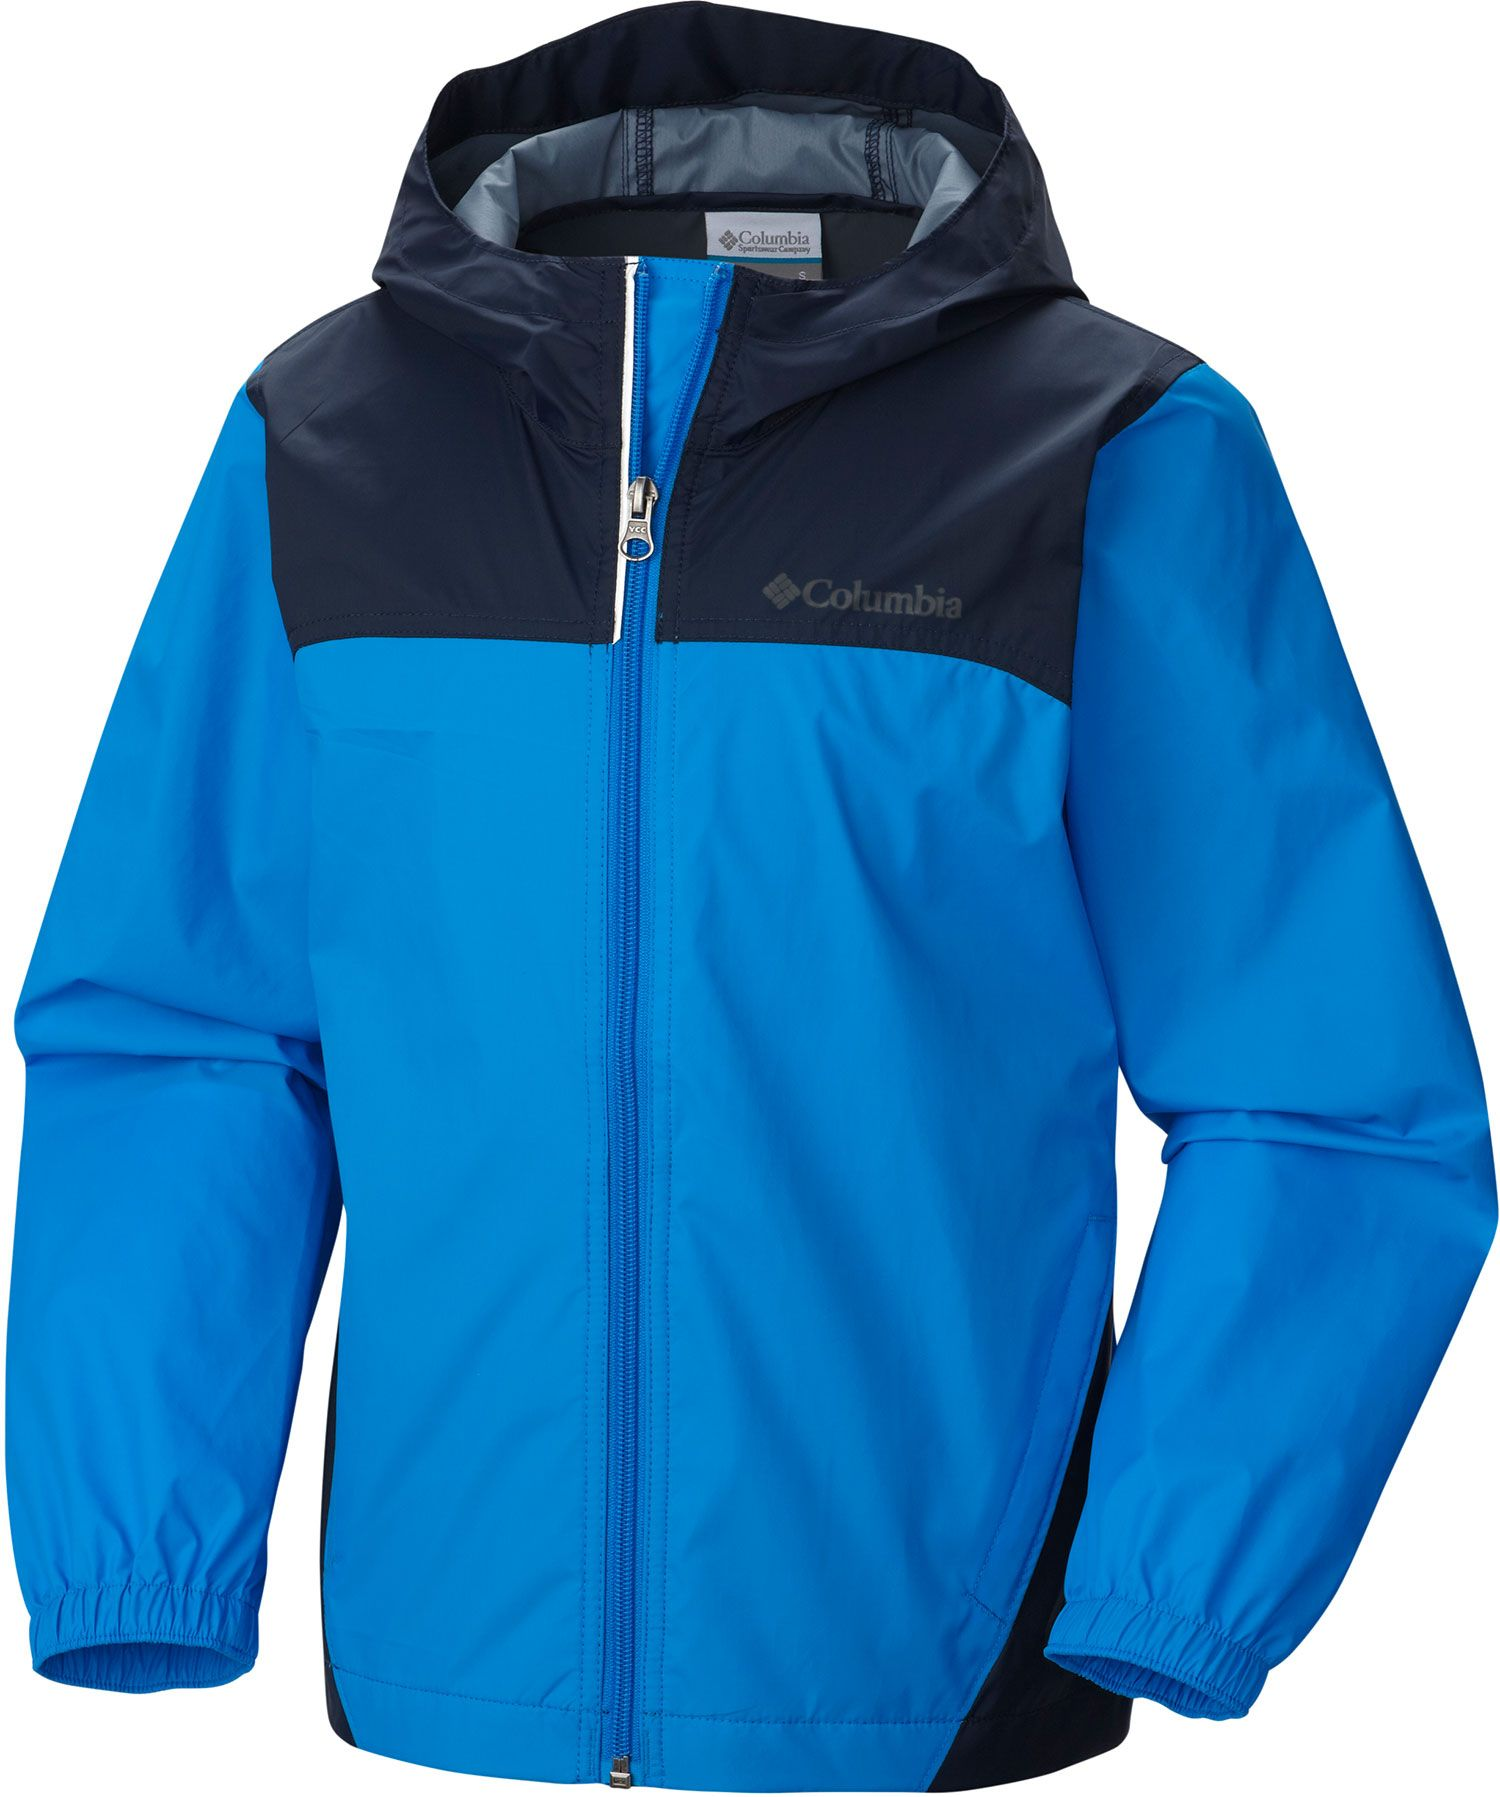 Blue Waterproof Jacket Designer Jackets